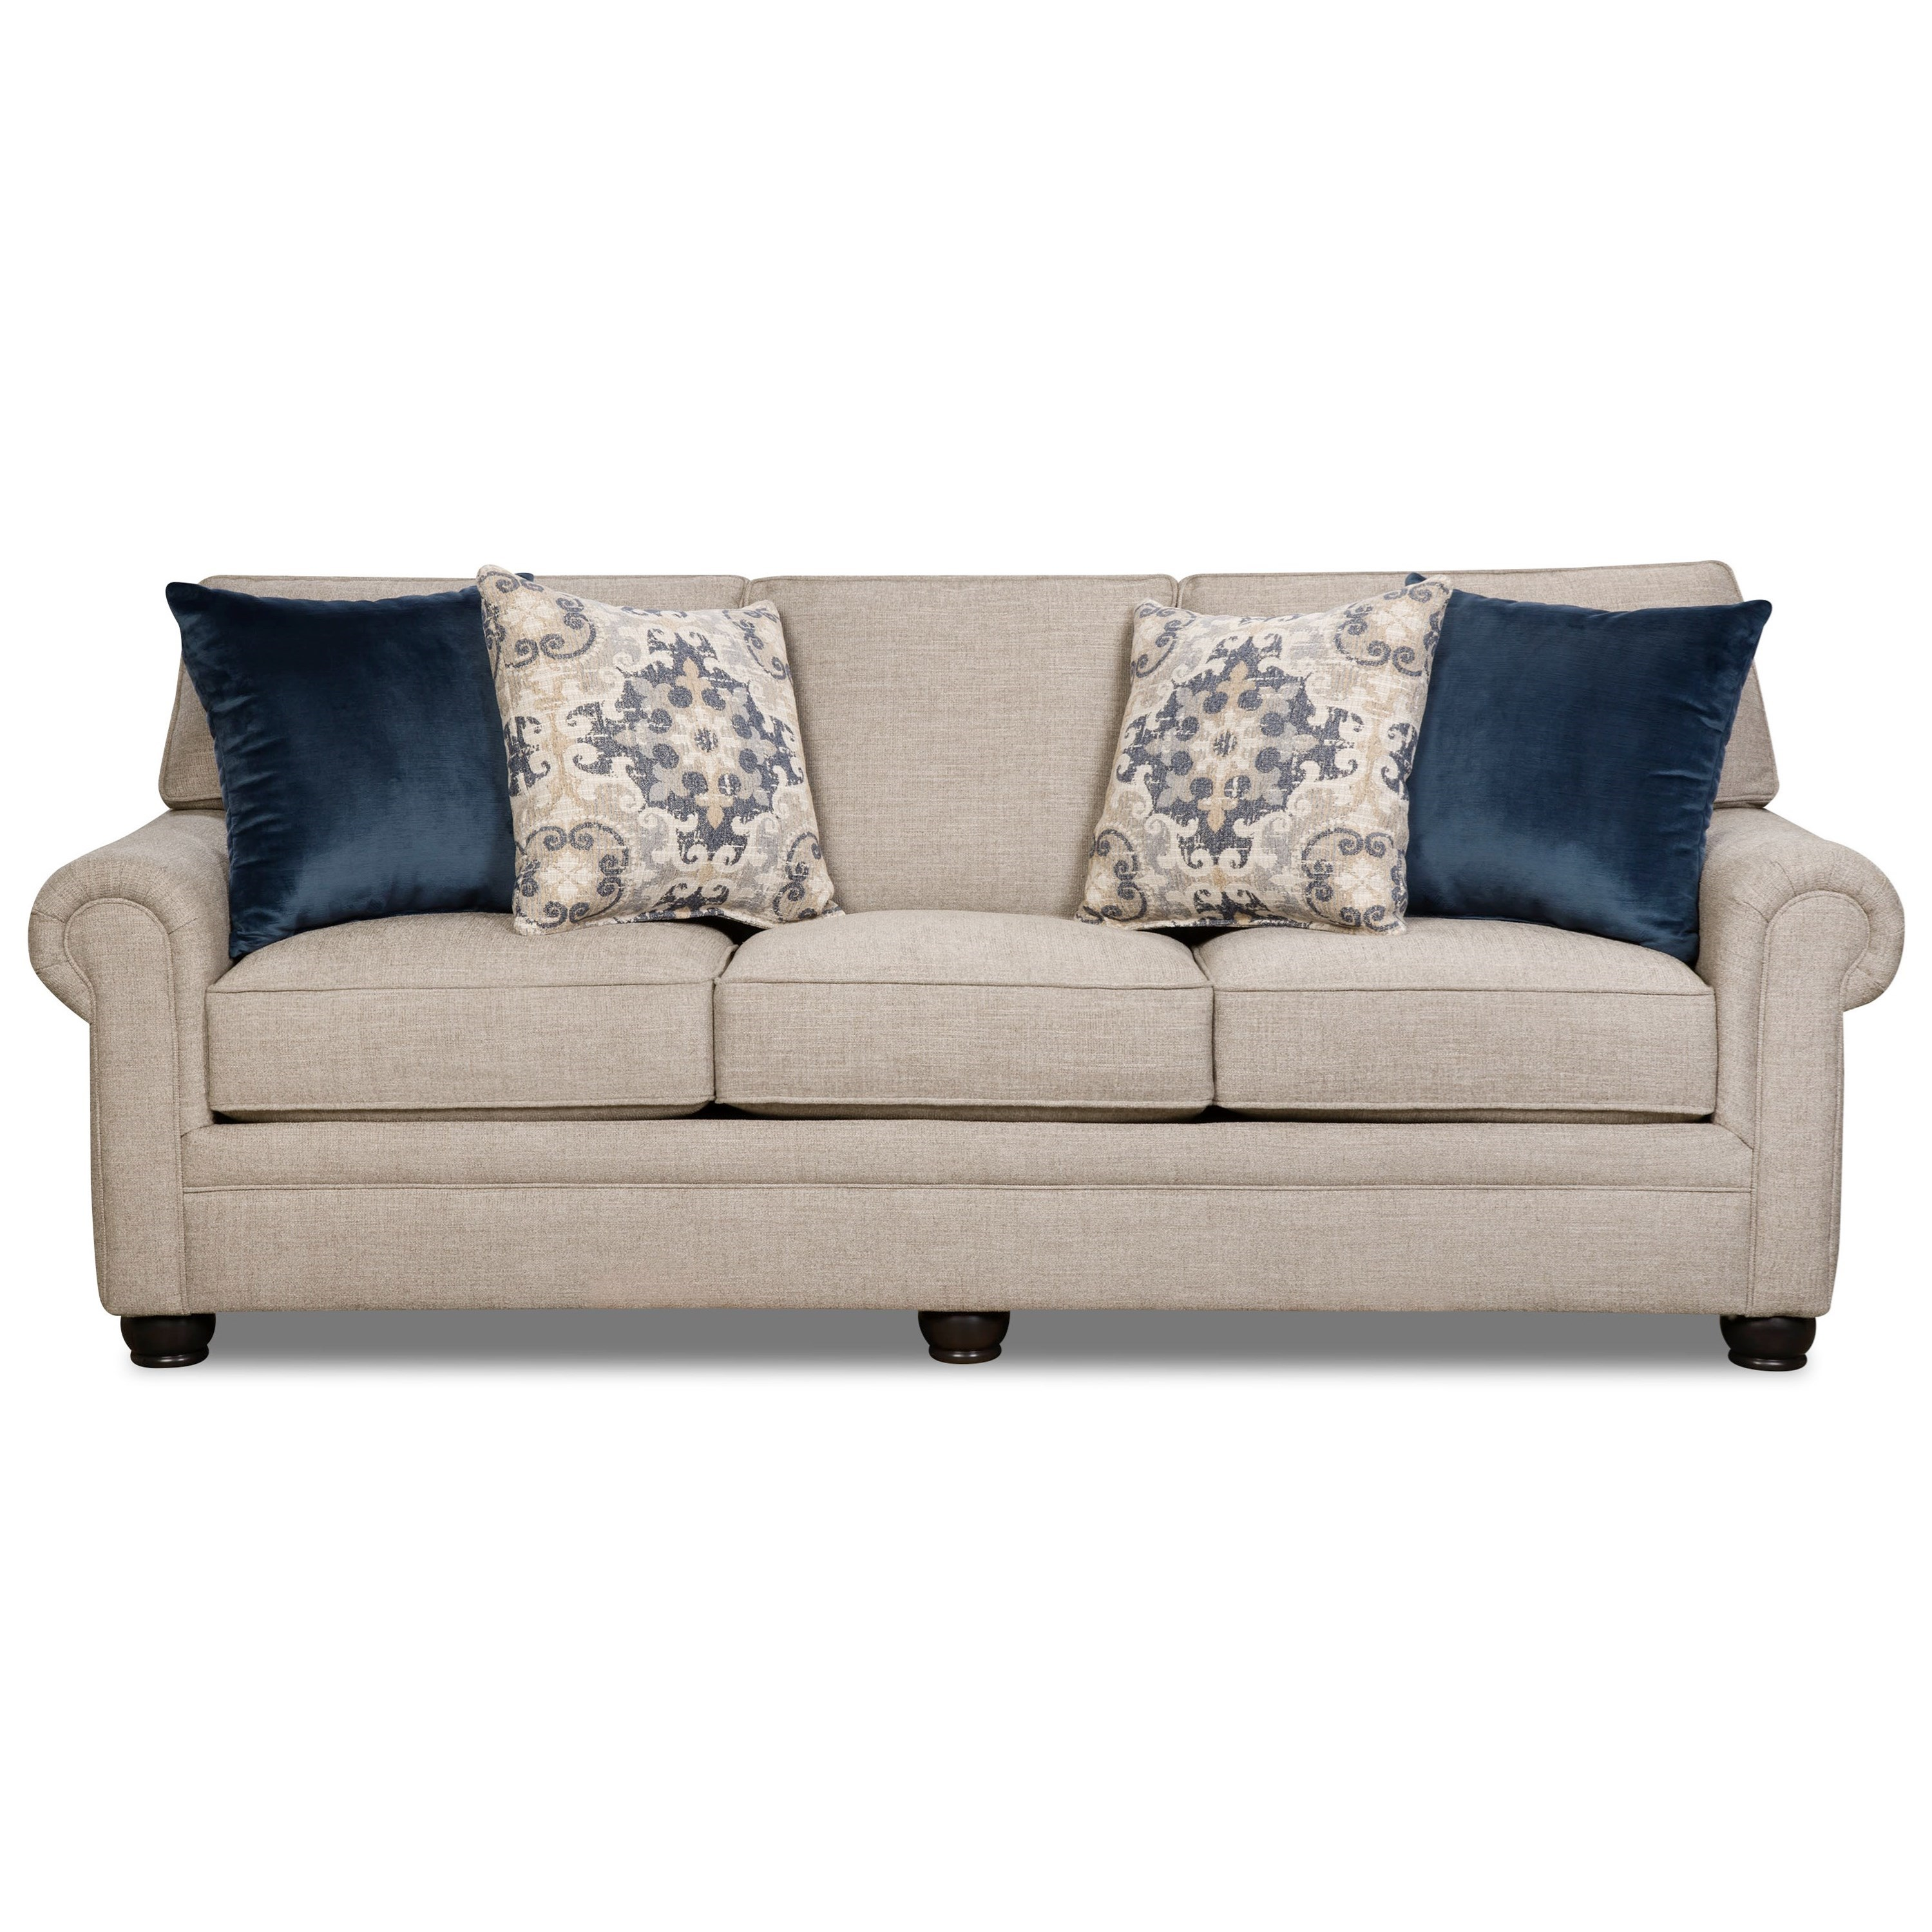 97C0 Sofa by Corinthian at Standard Furniture